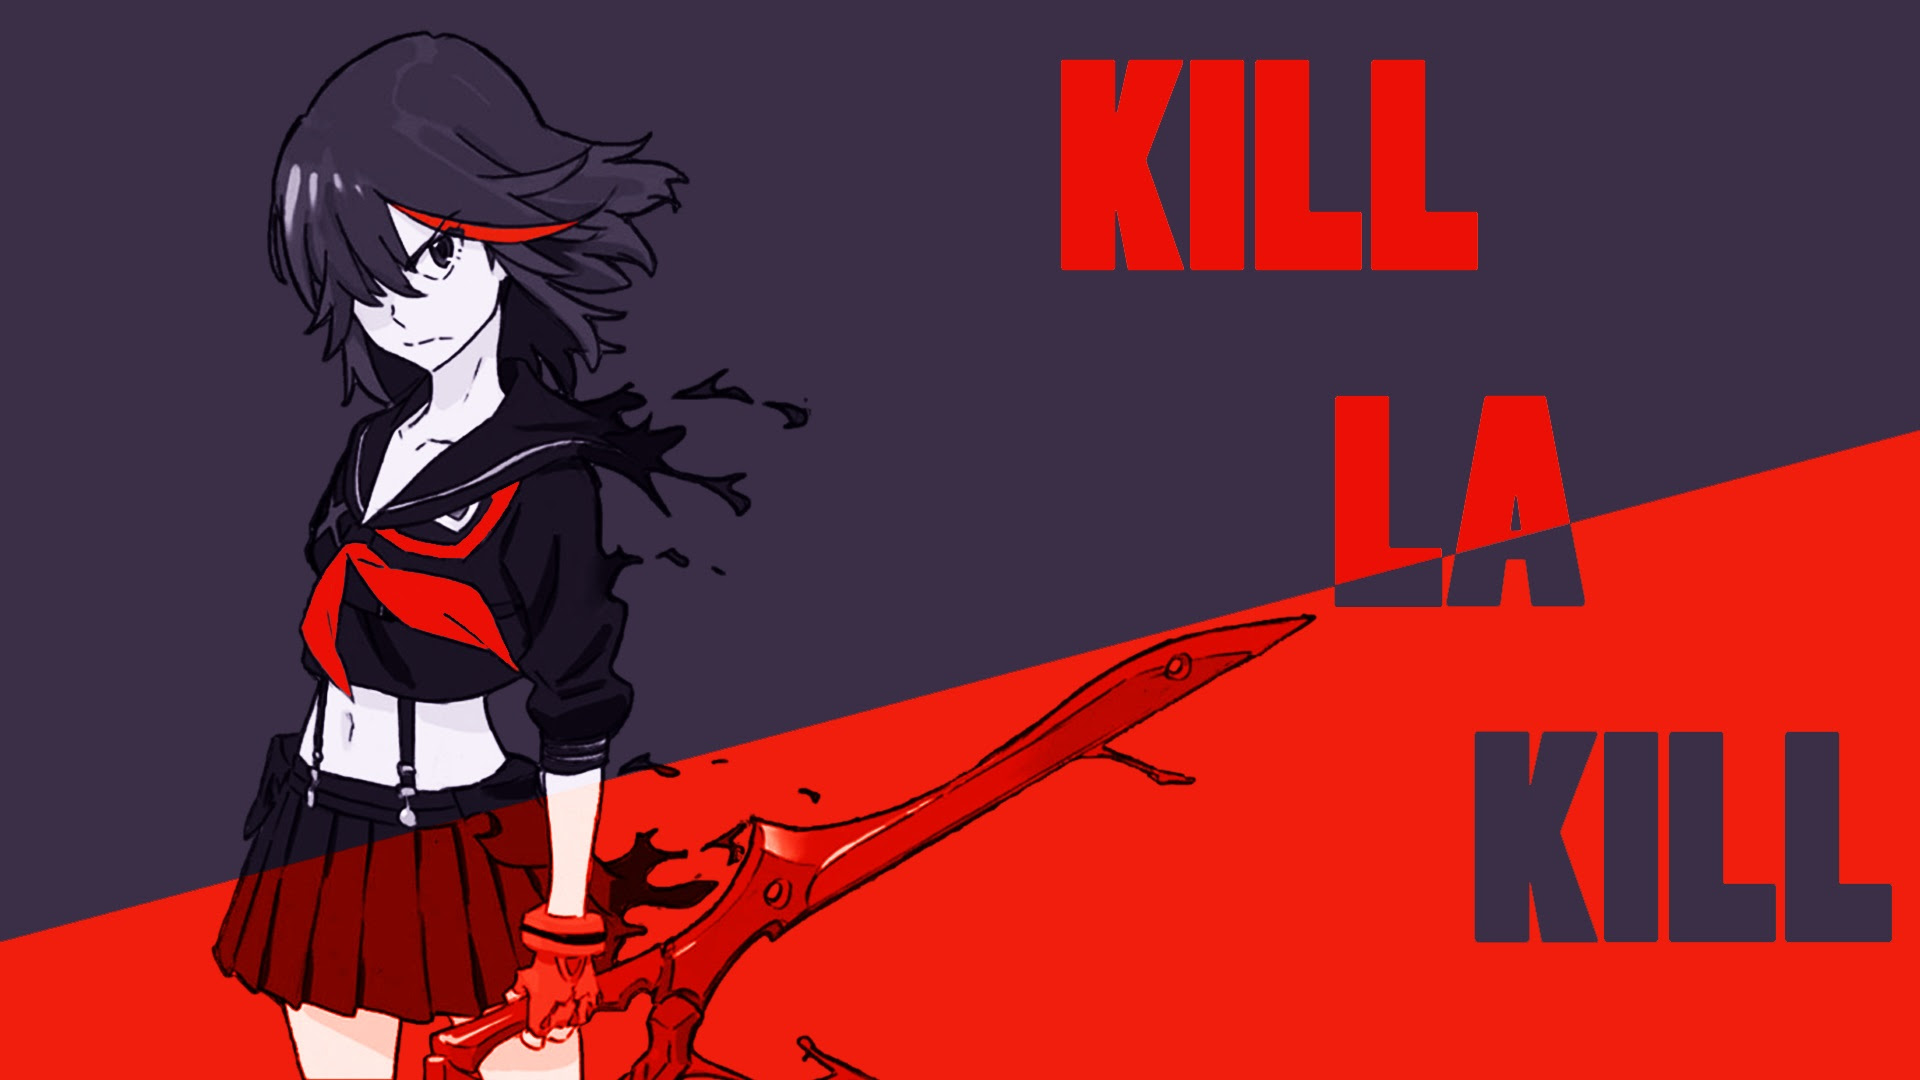 Kill La Kill Wallpaper 20